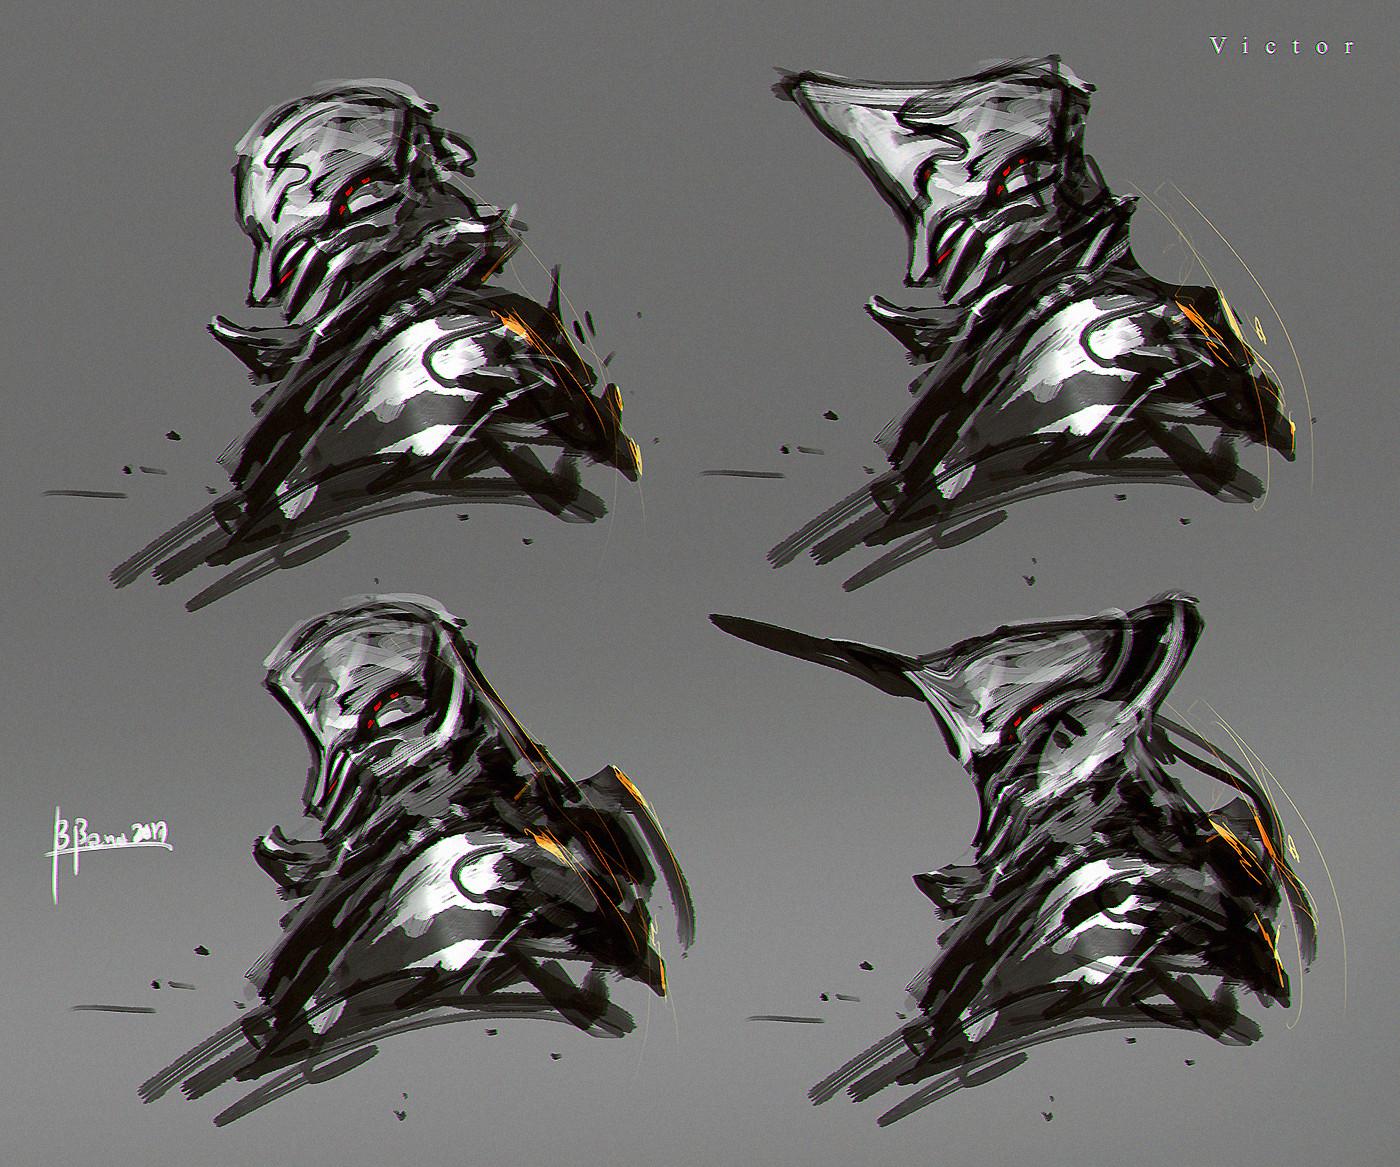 Benedick bana warframe hex design victor lores